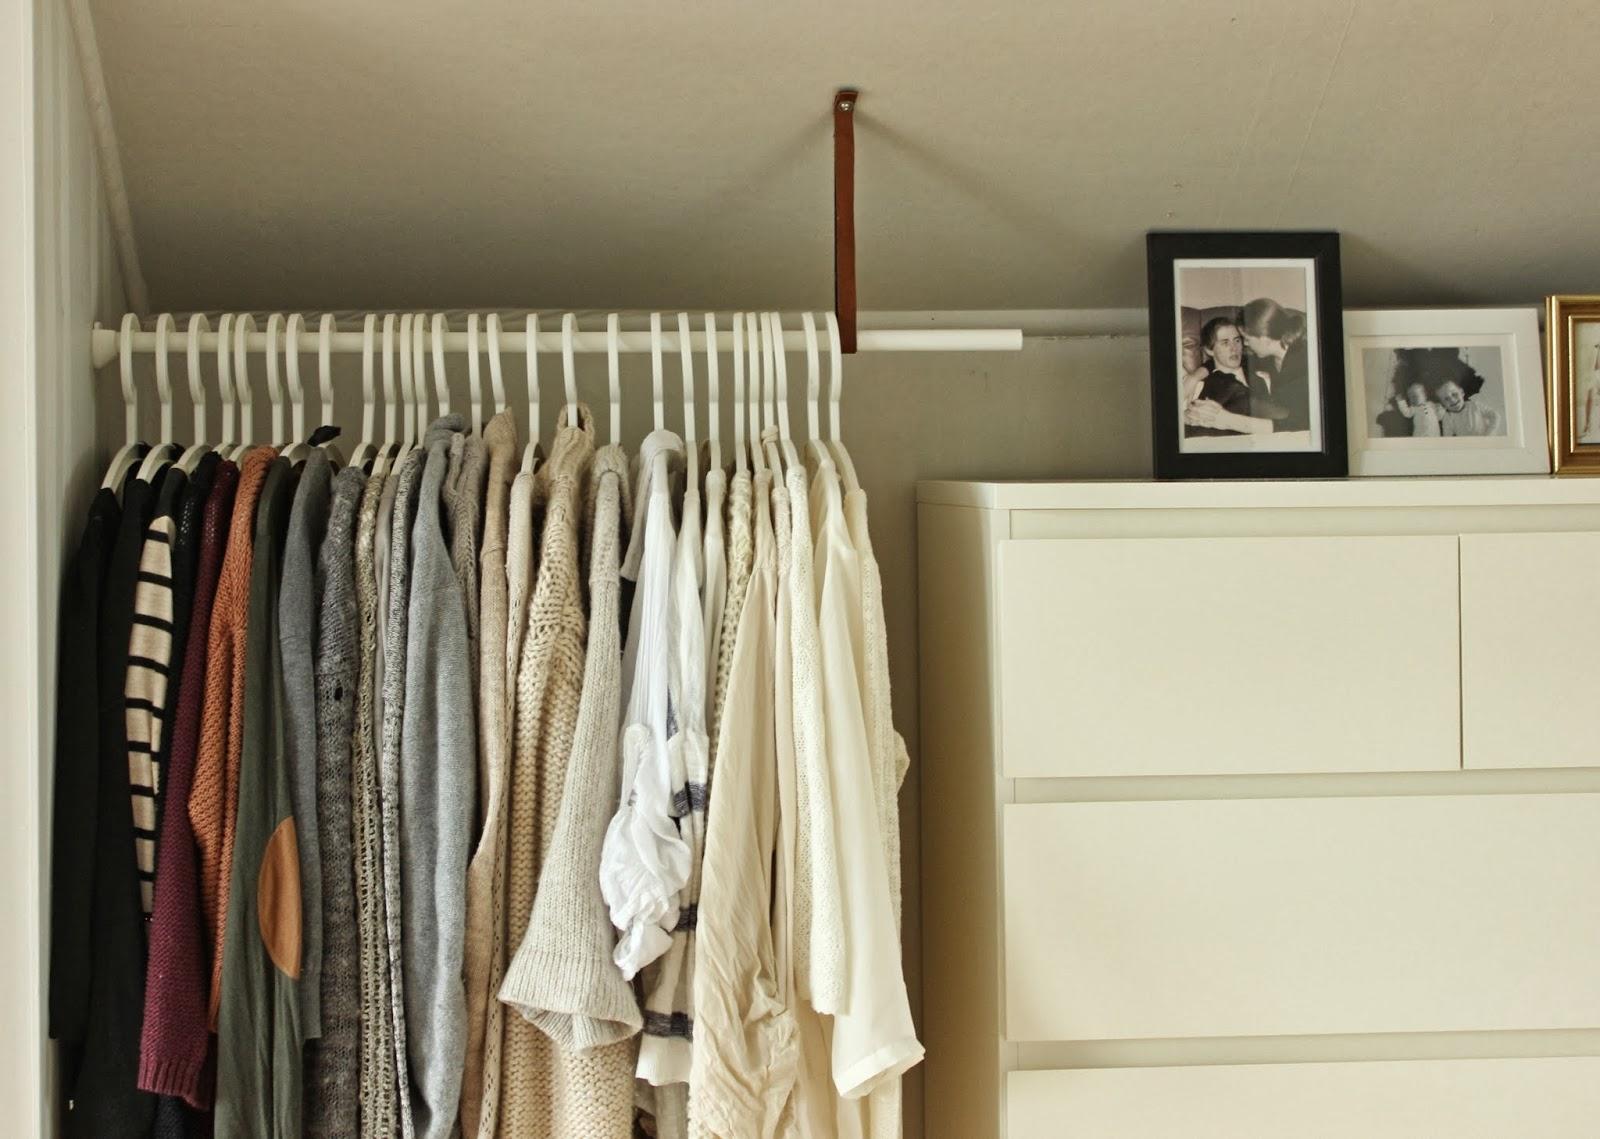 Hagenhuset garderobestang for Garderobe querstange